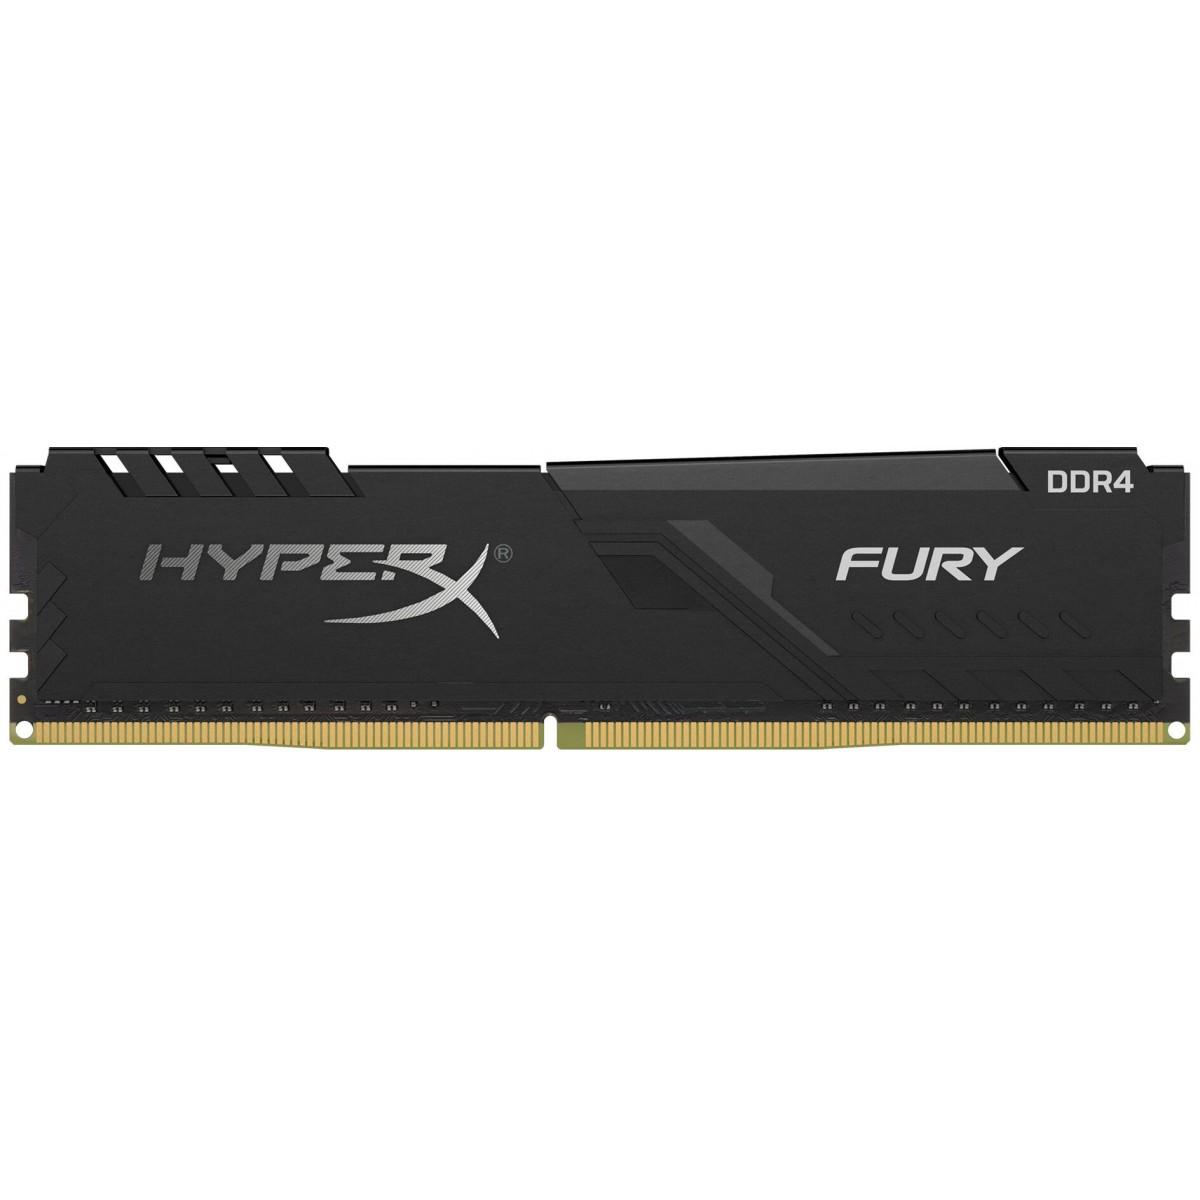 Memória DDR4 Kingston HyperX Fury, 8GB 2666MHz, Black, HX426C16FB3/8